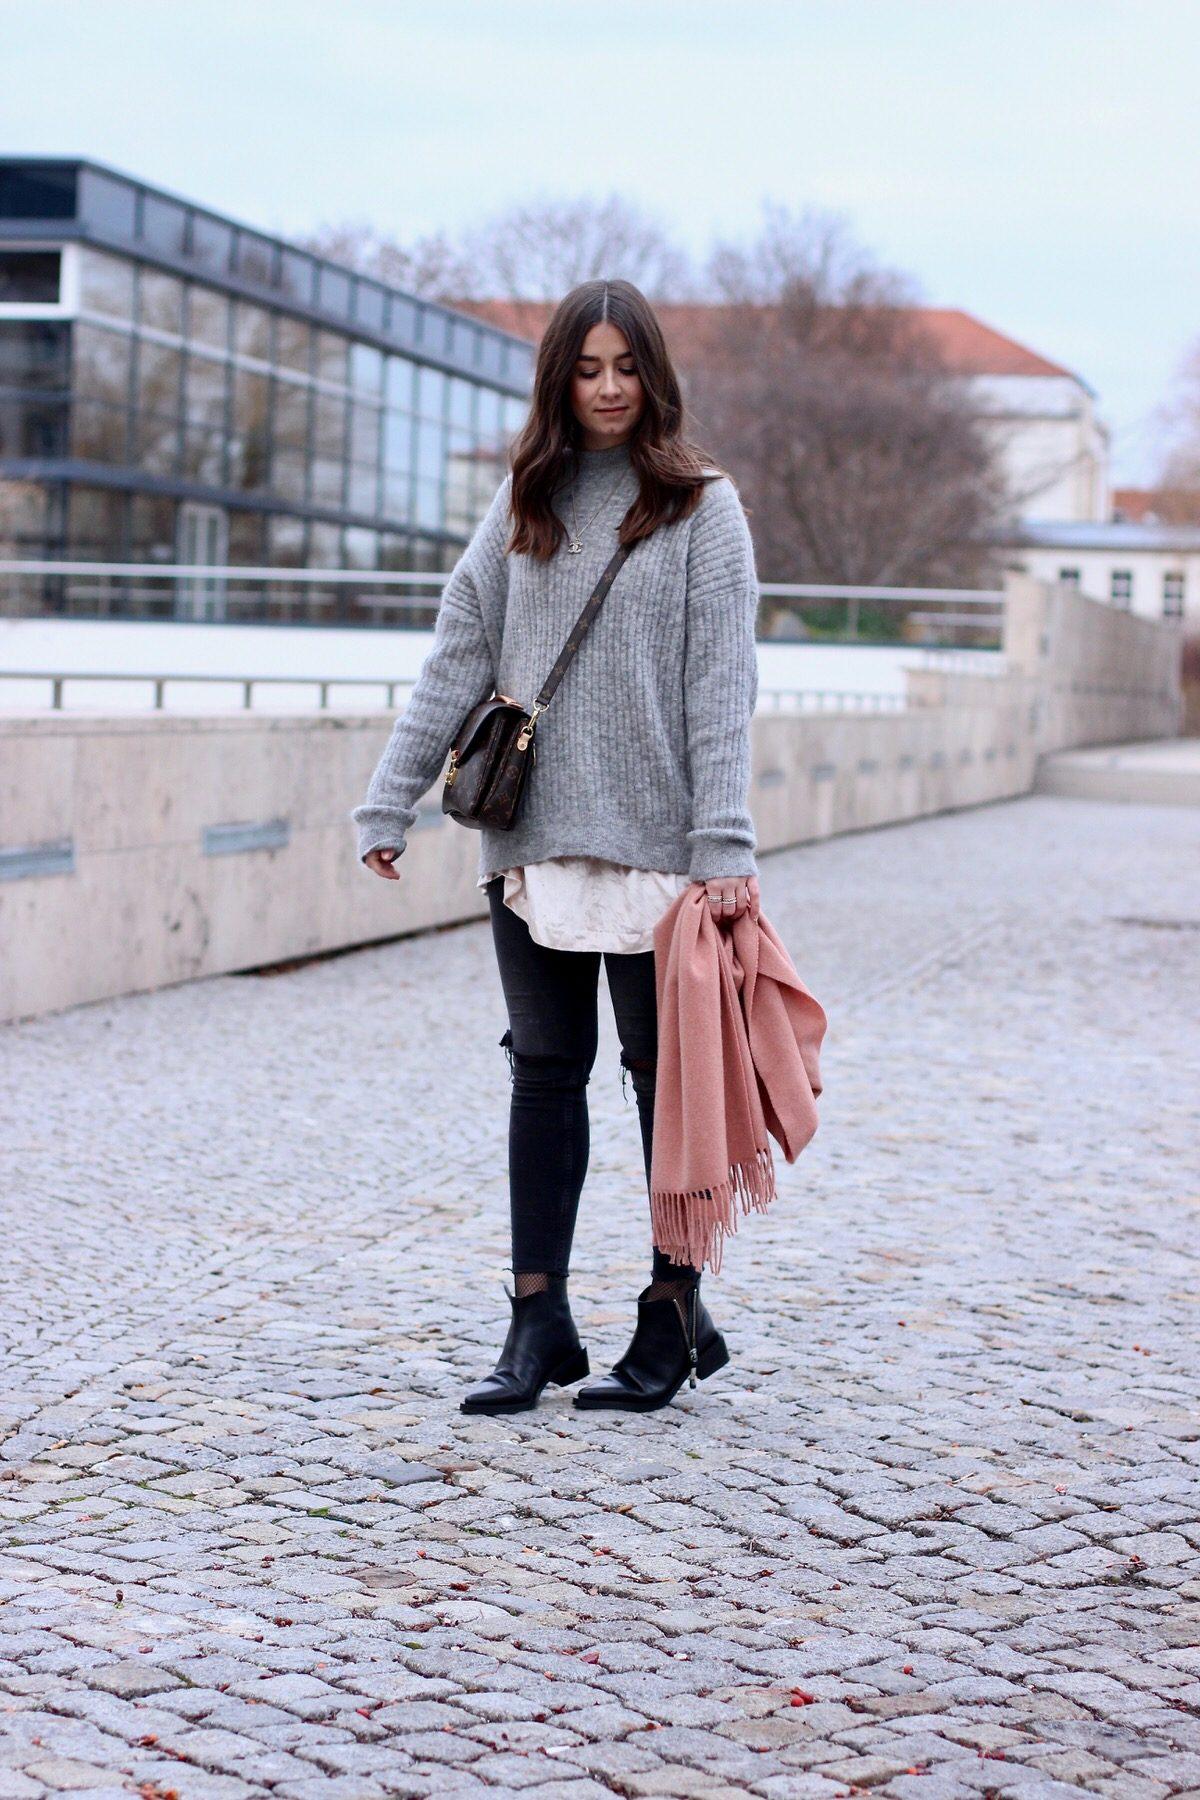 Louis Vuitton Pochette Métis, Acne Studios Schal, Zign Studio Boots, Zara, H&M, Edited